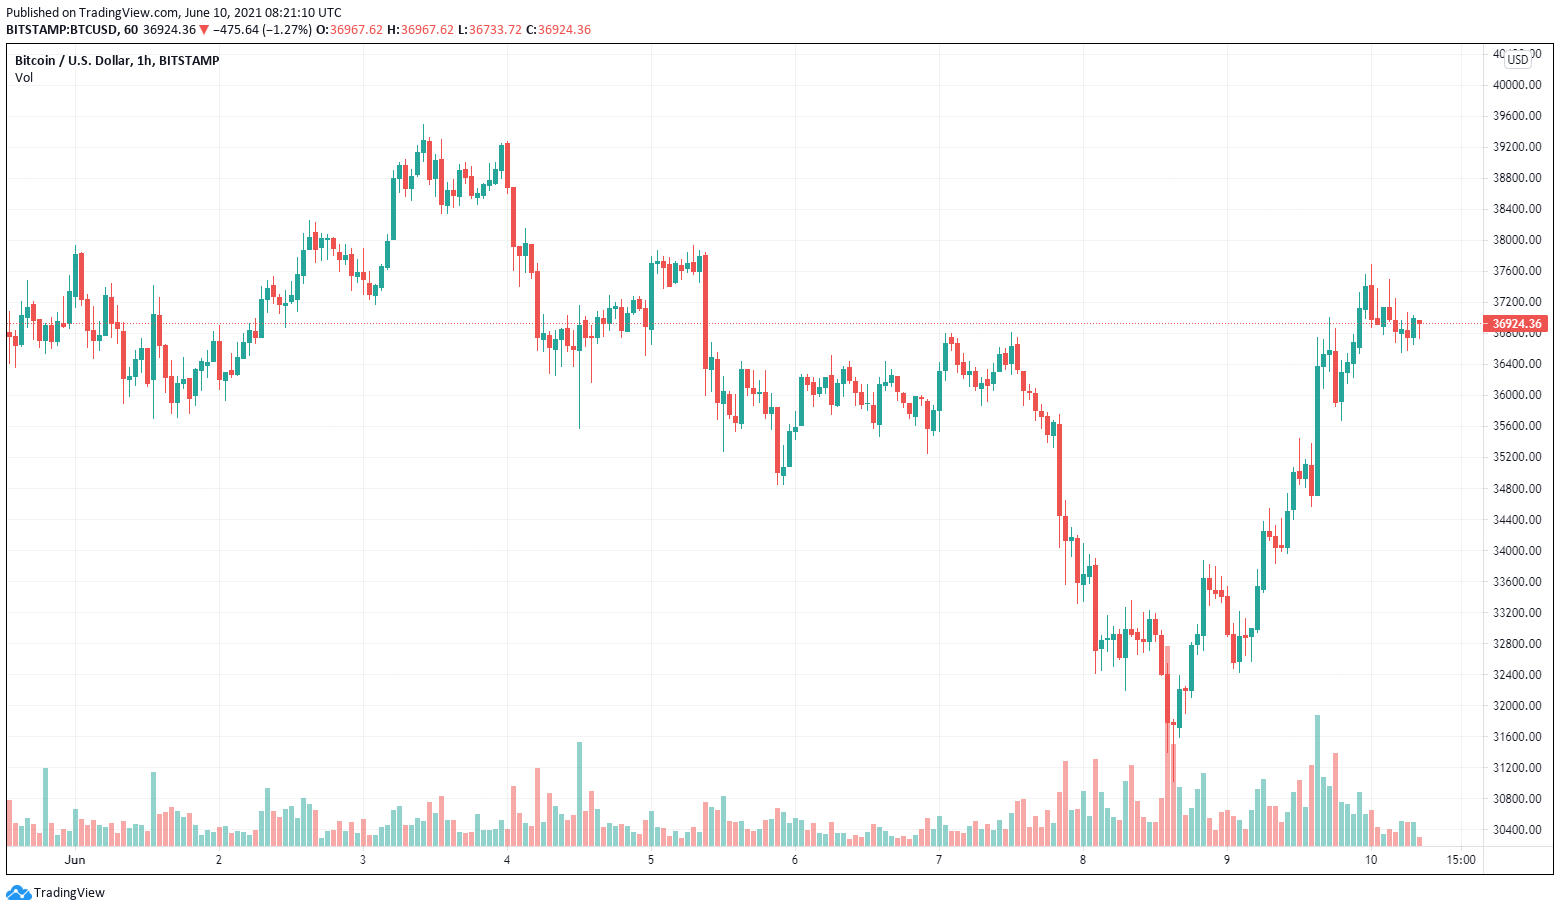 BTC/USD, graficocandlestick a un'ora(Bitstamp). Fonte: TradingView